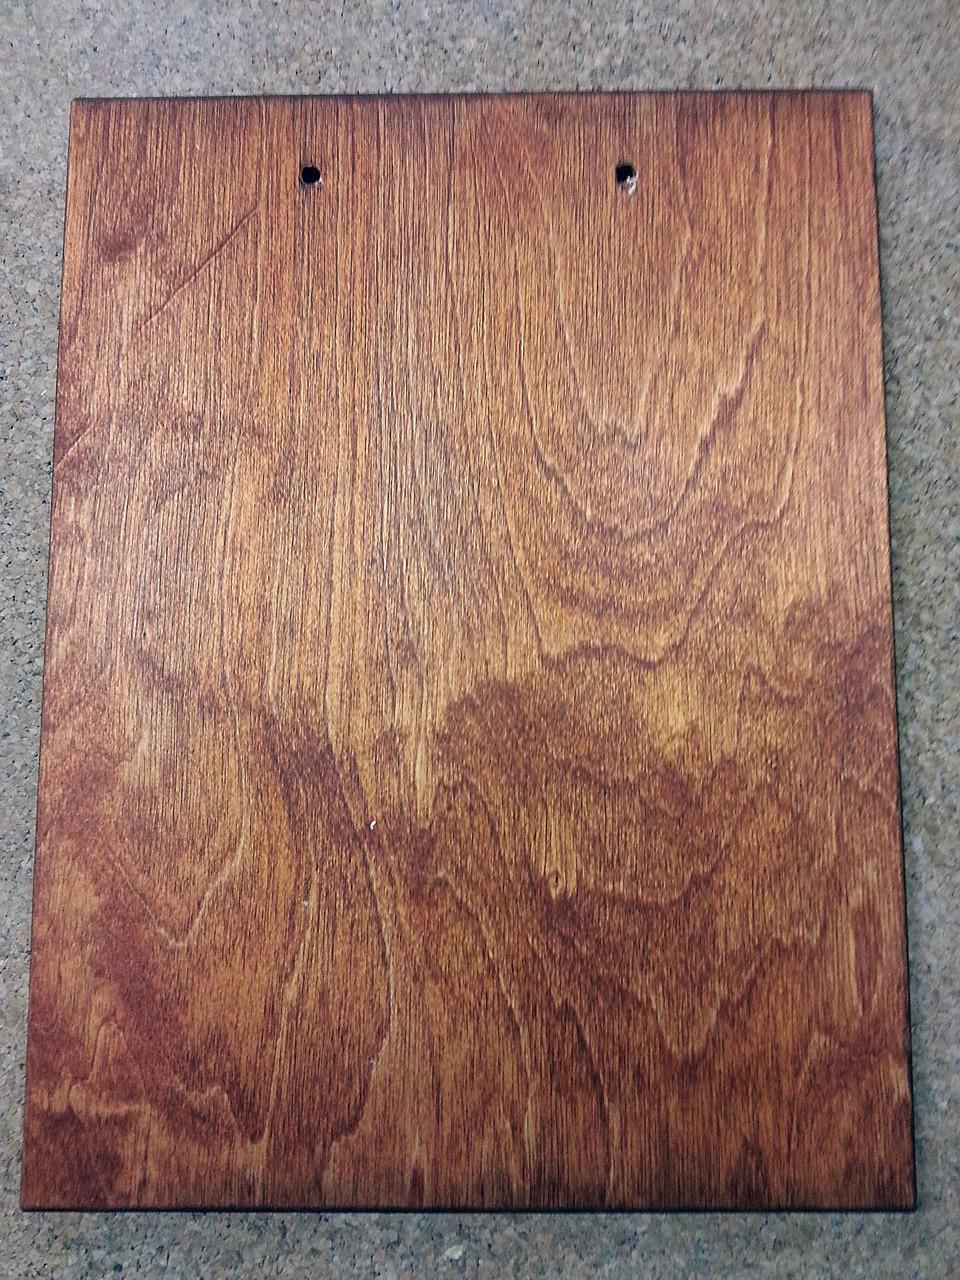 hardwood floor repair victoria bc of inspiration west wind hardwood intended for menu boards alaska